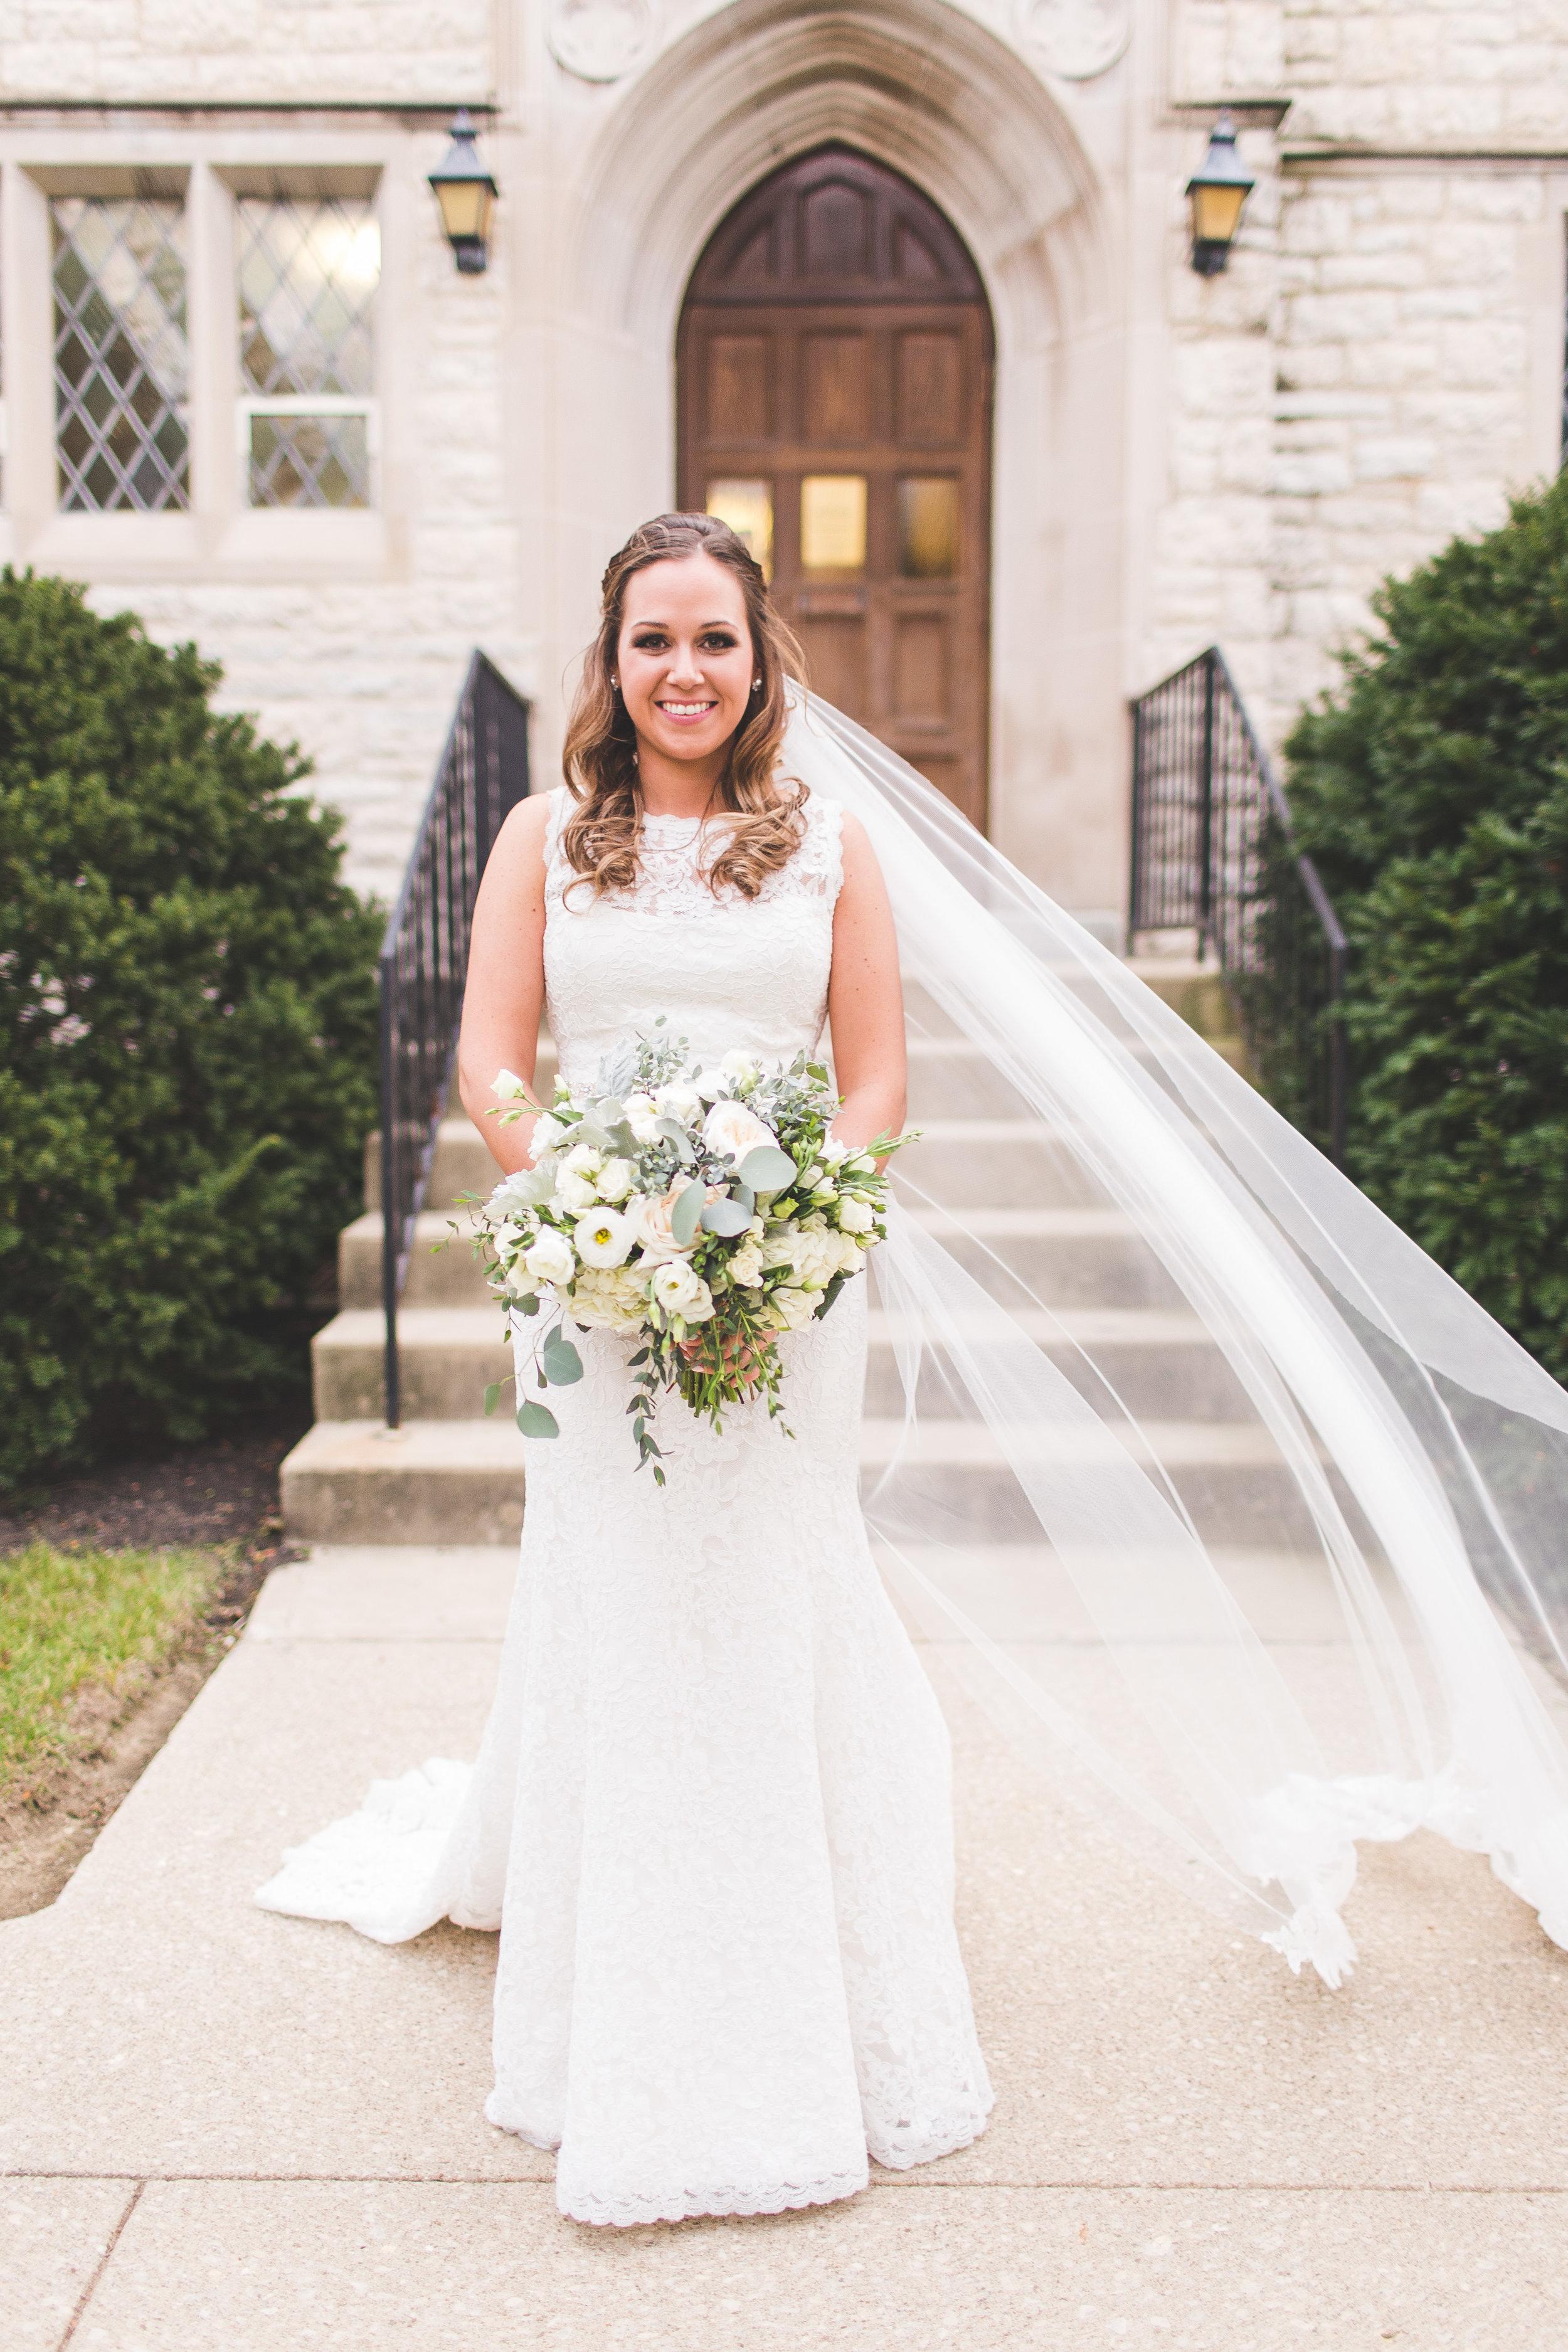 bridal portrait wedding day outside traditional church